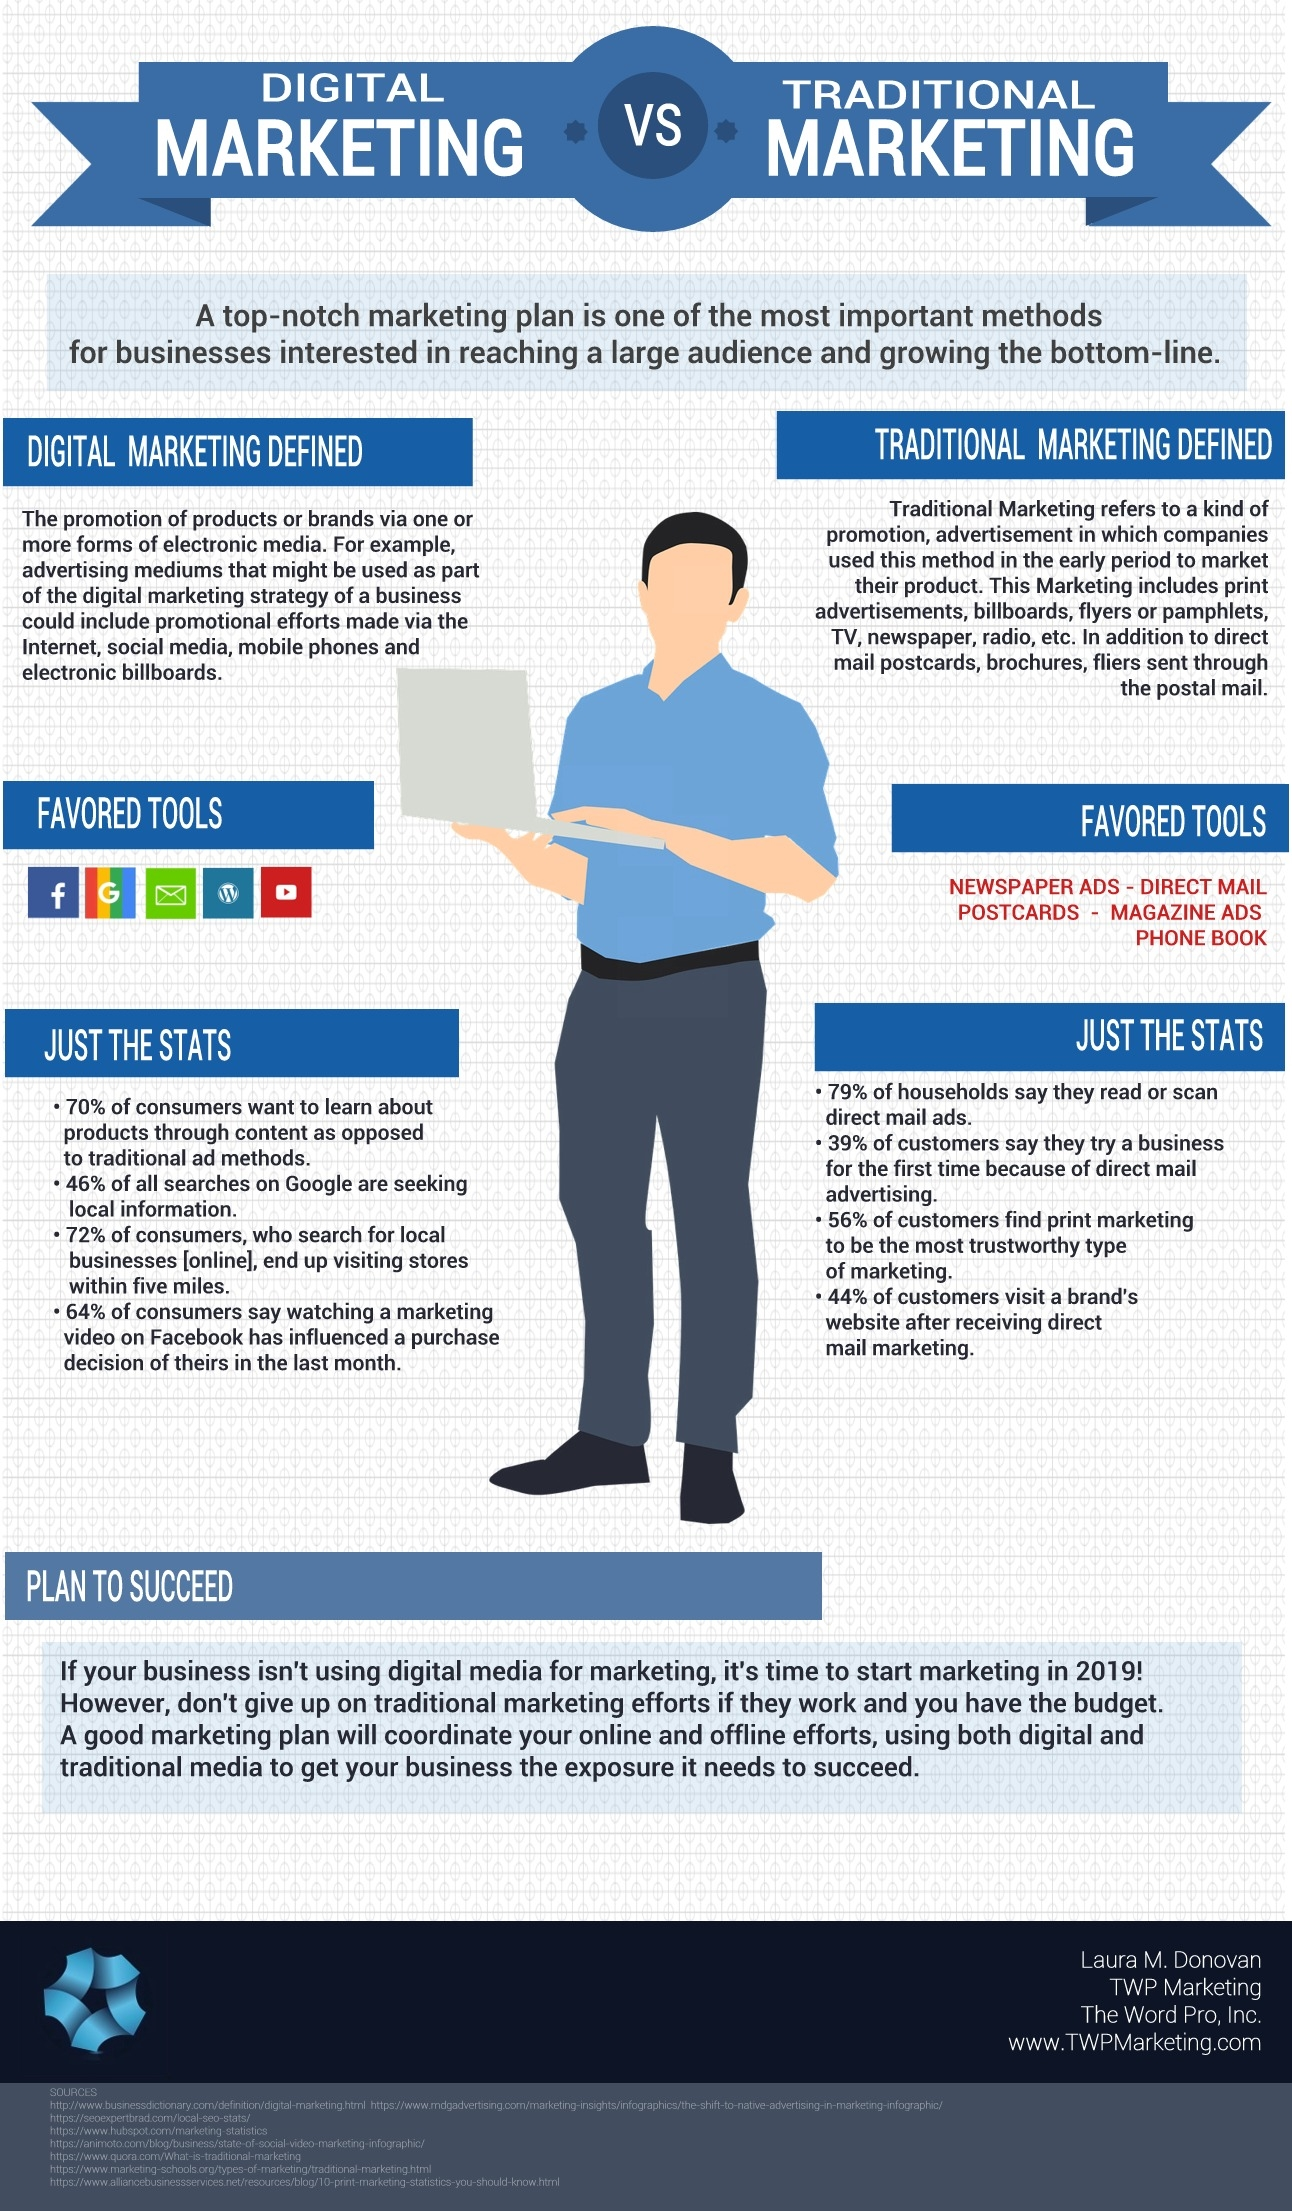 Digital Marketing vs. Traditional Marketing [Infographic]